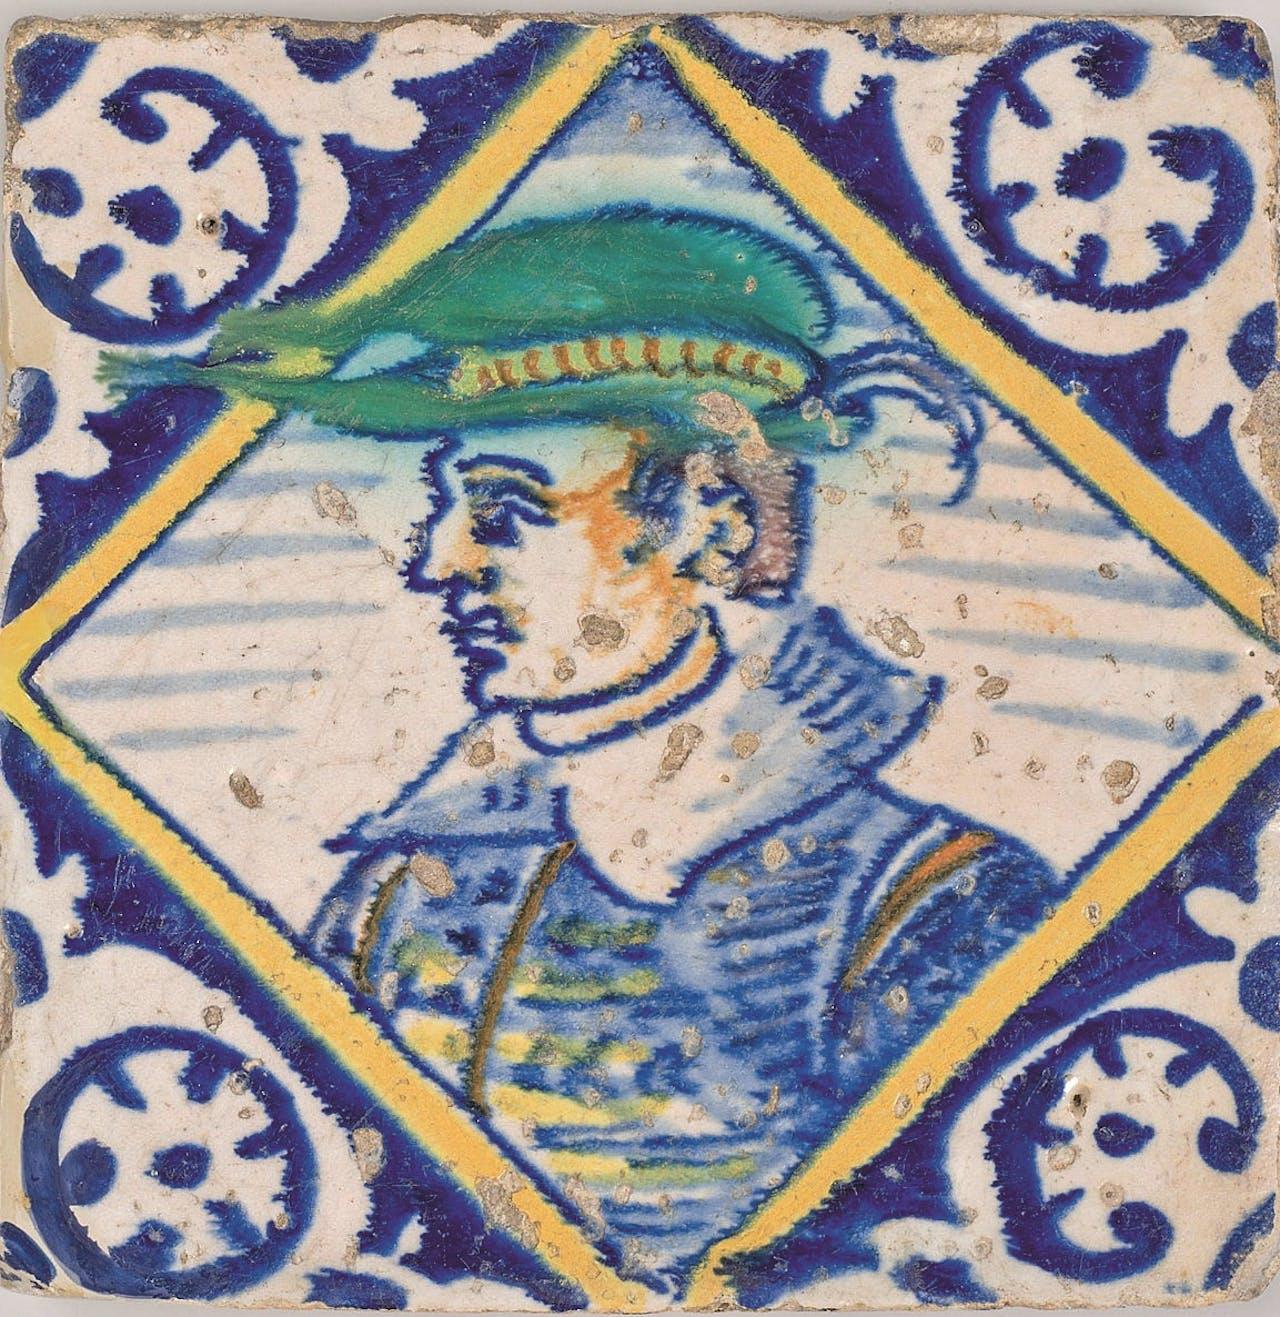 Portret in kwadraat, uitgespaard hoekmotief, 1600-1625.